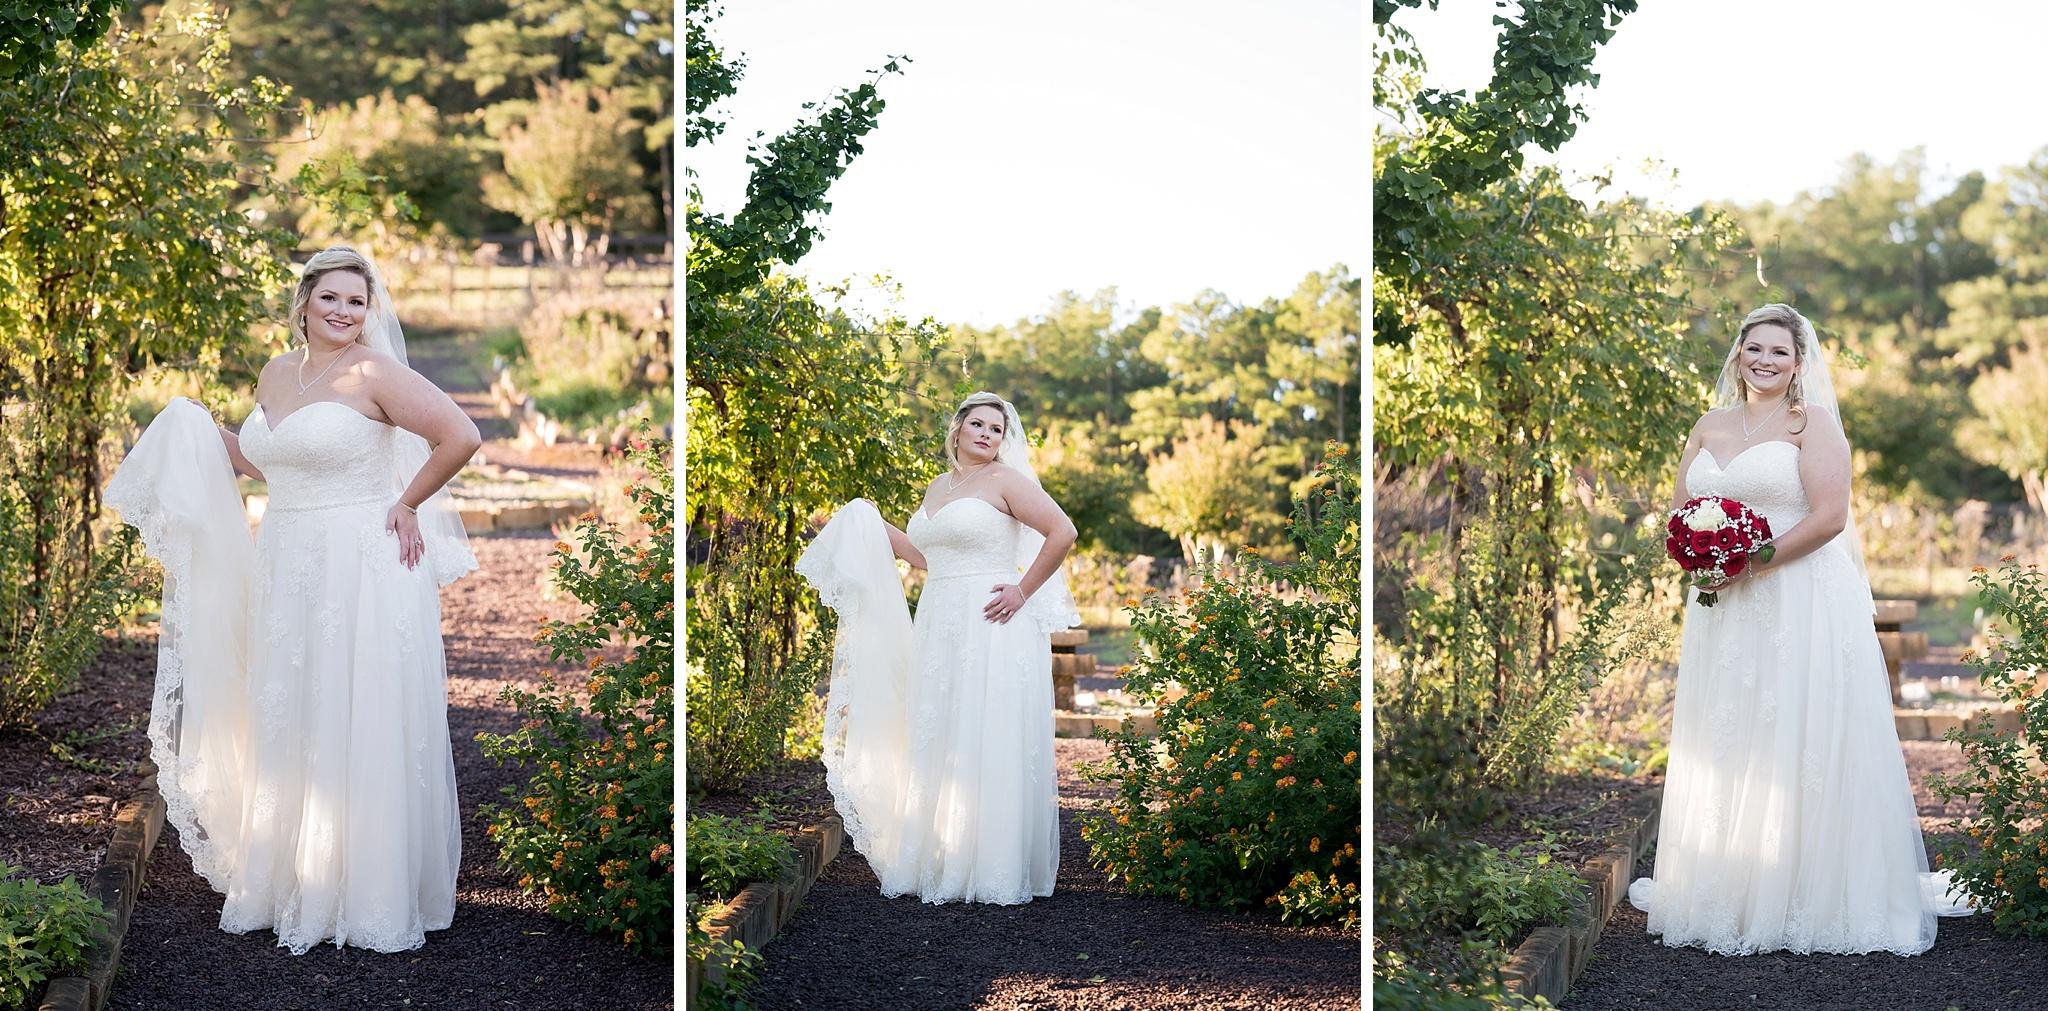 Little-Herb-House-Wedding-Photographer-061.jpg